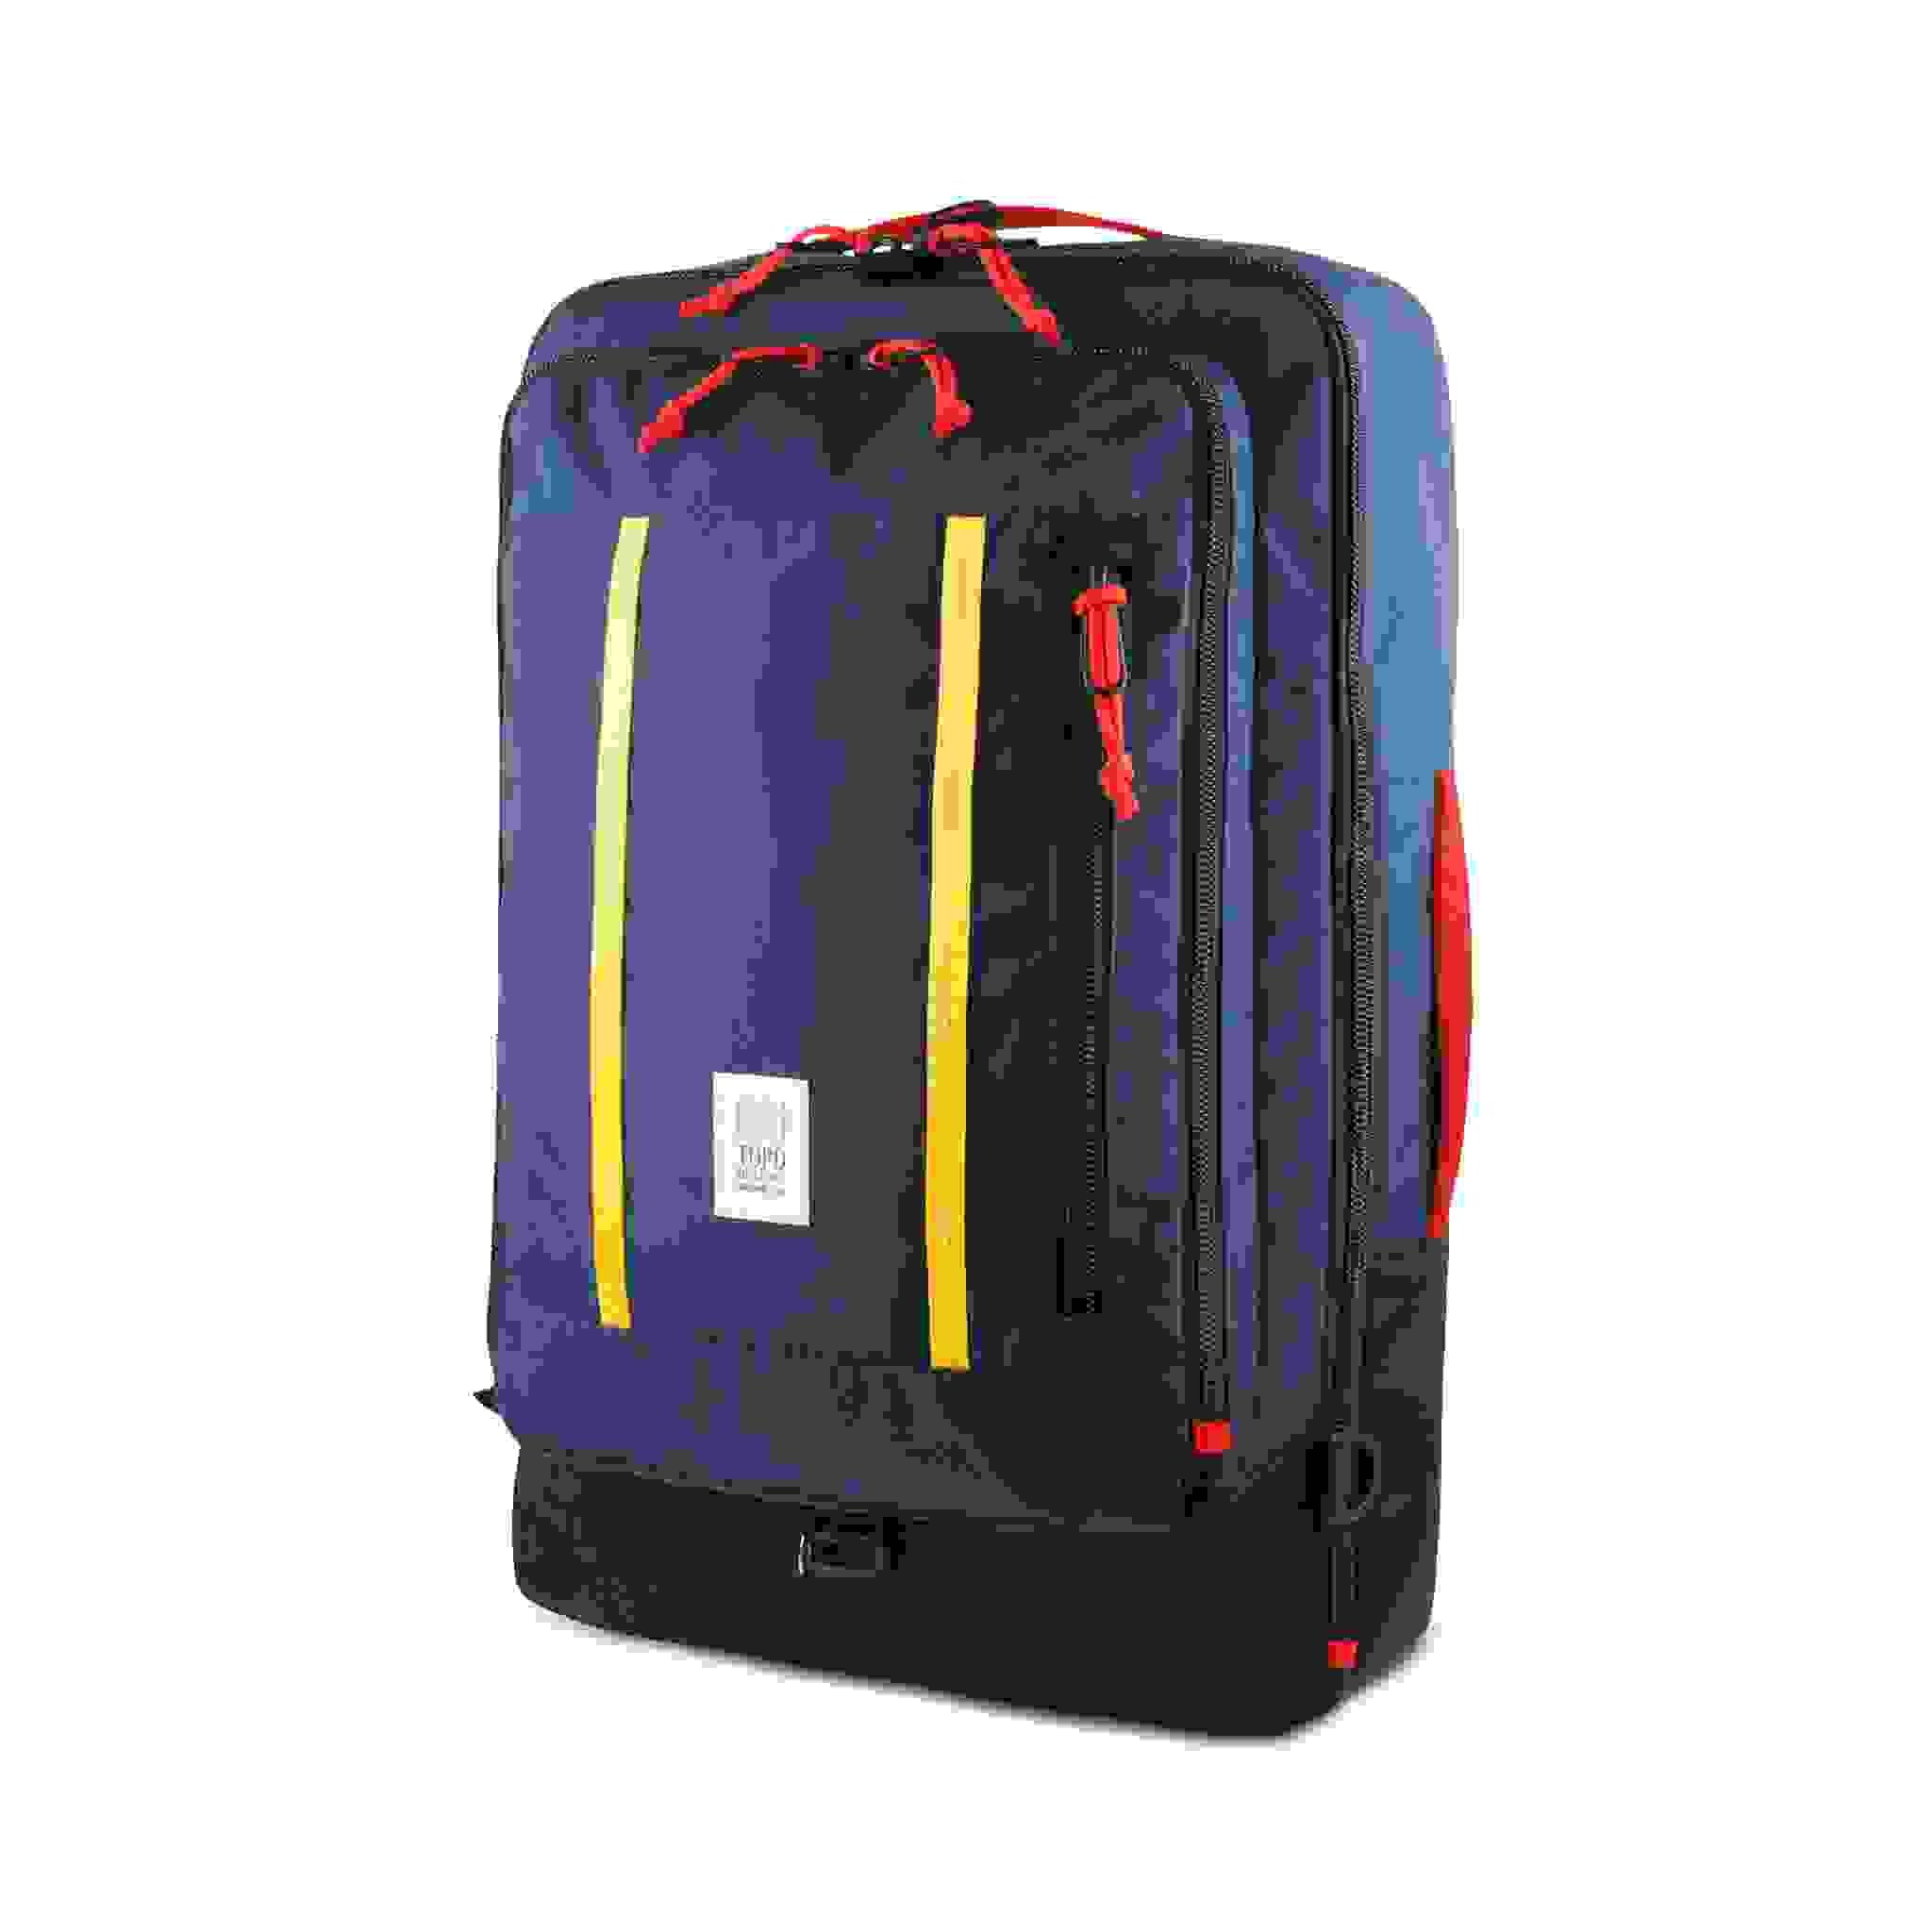 Topo Designs Travel Pack - Best Digital Nomad Backpacks - ABrotherAbroad.com